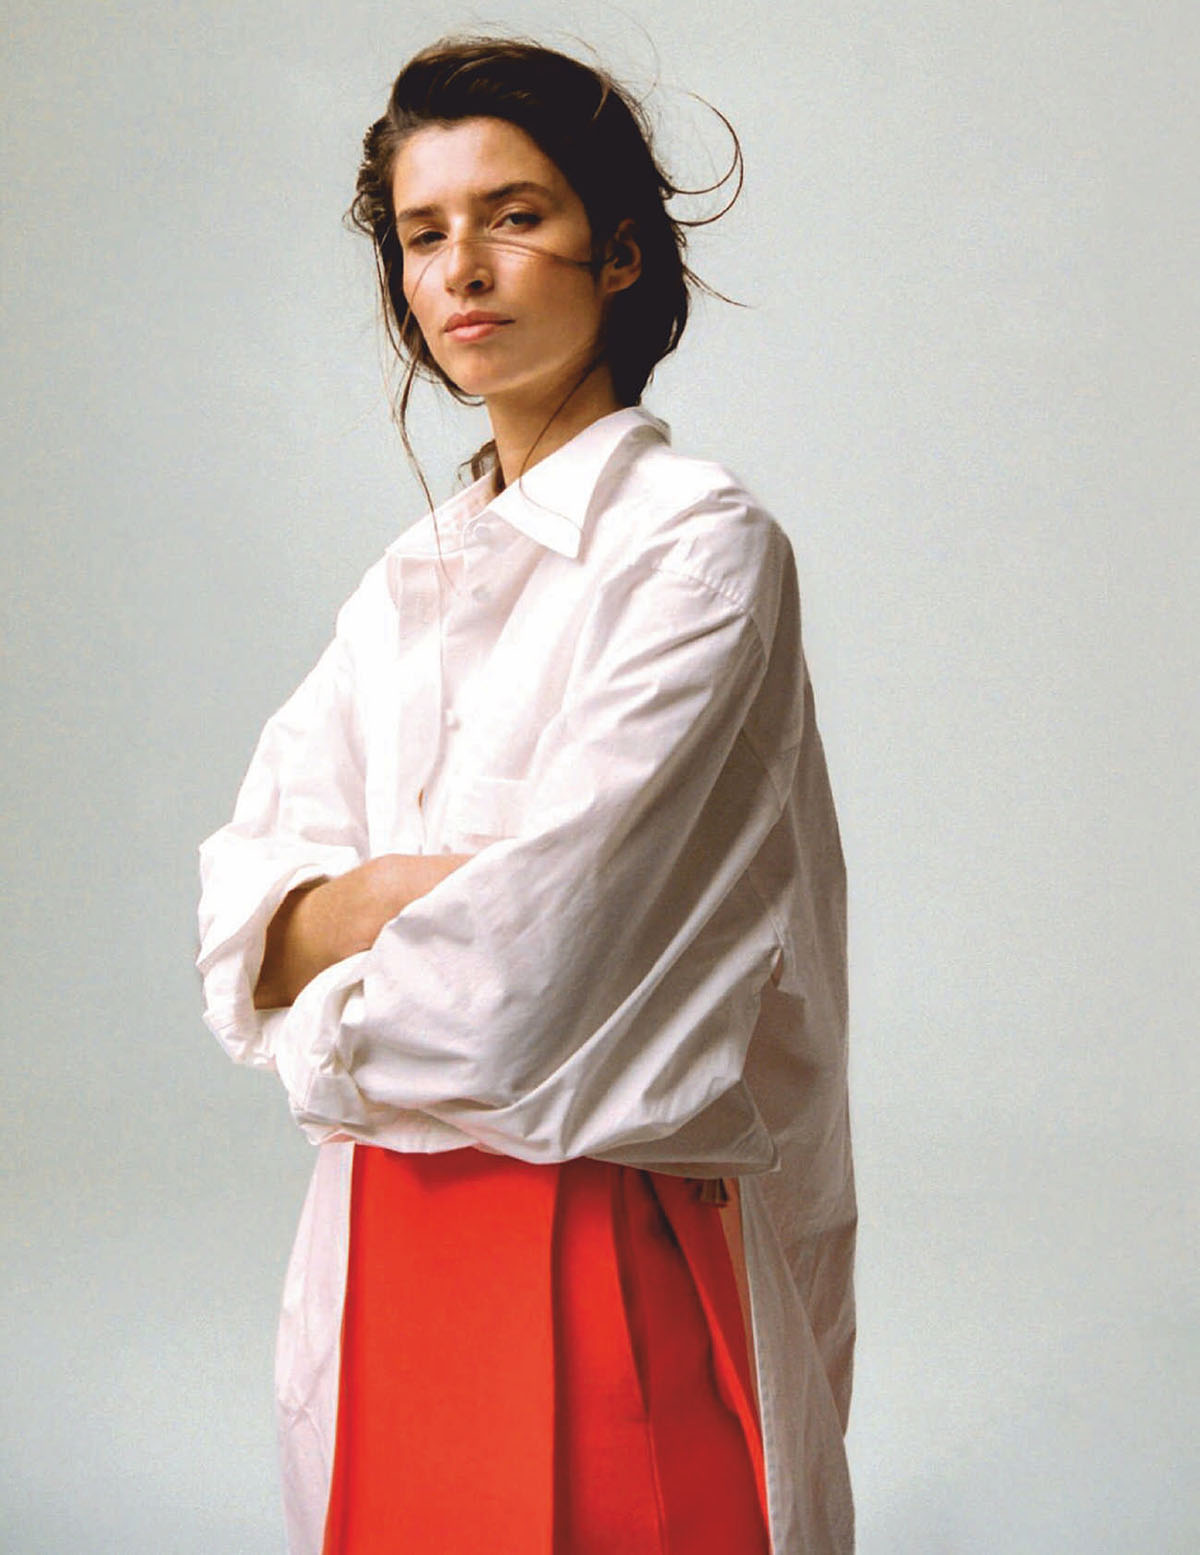 Eeva Lioni by Fede Delibes for Harper's Bazaar Spain March 2021